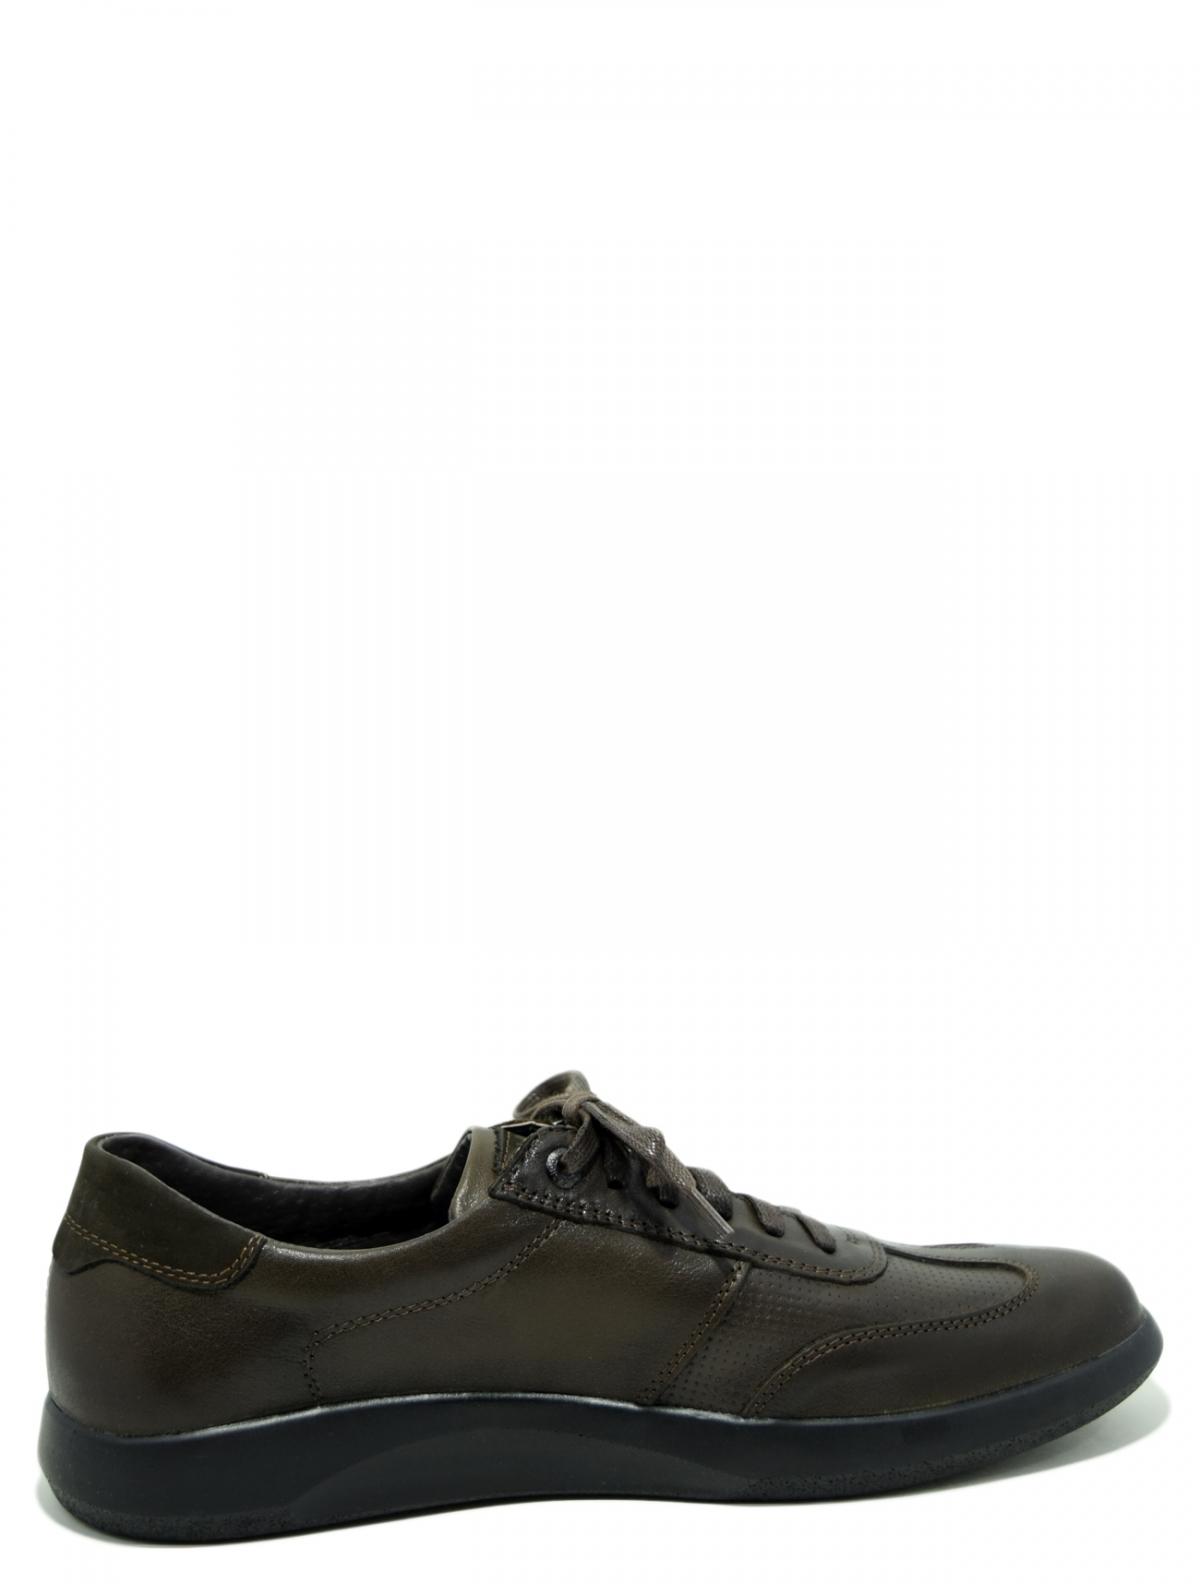 Rooman 500-328-C2L мужские туфли